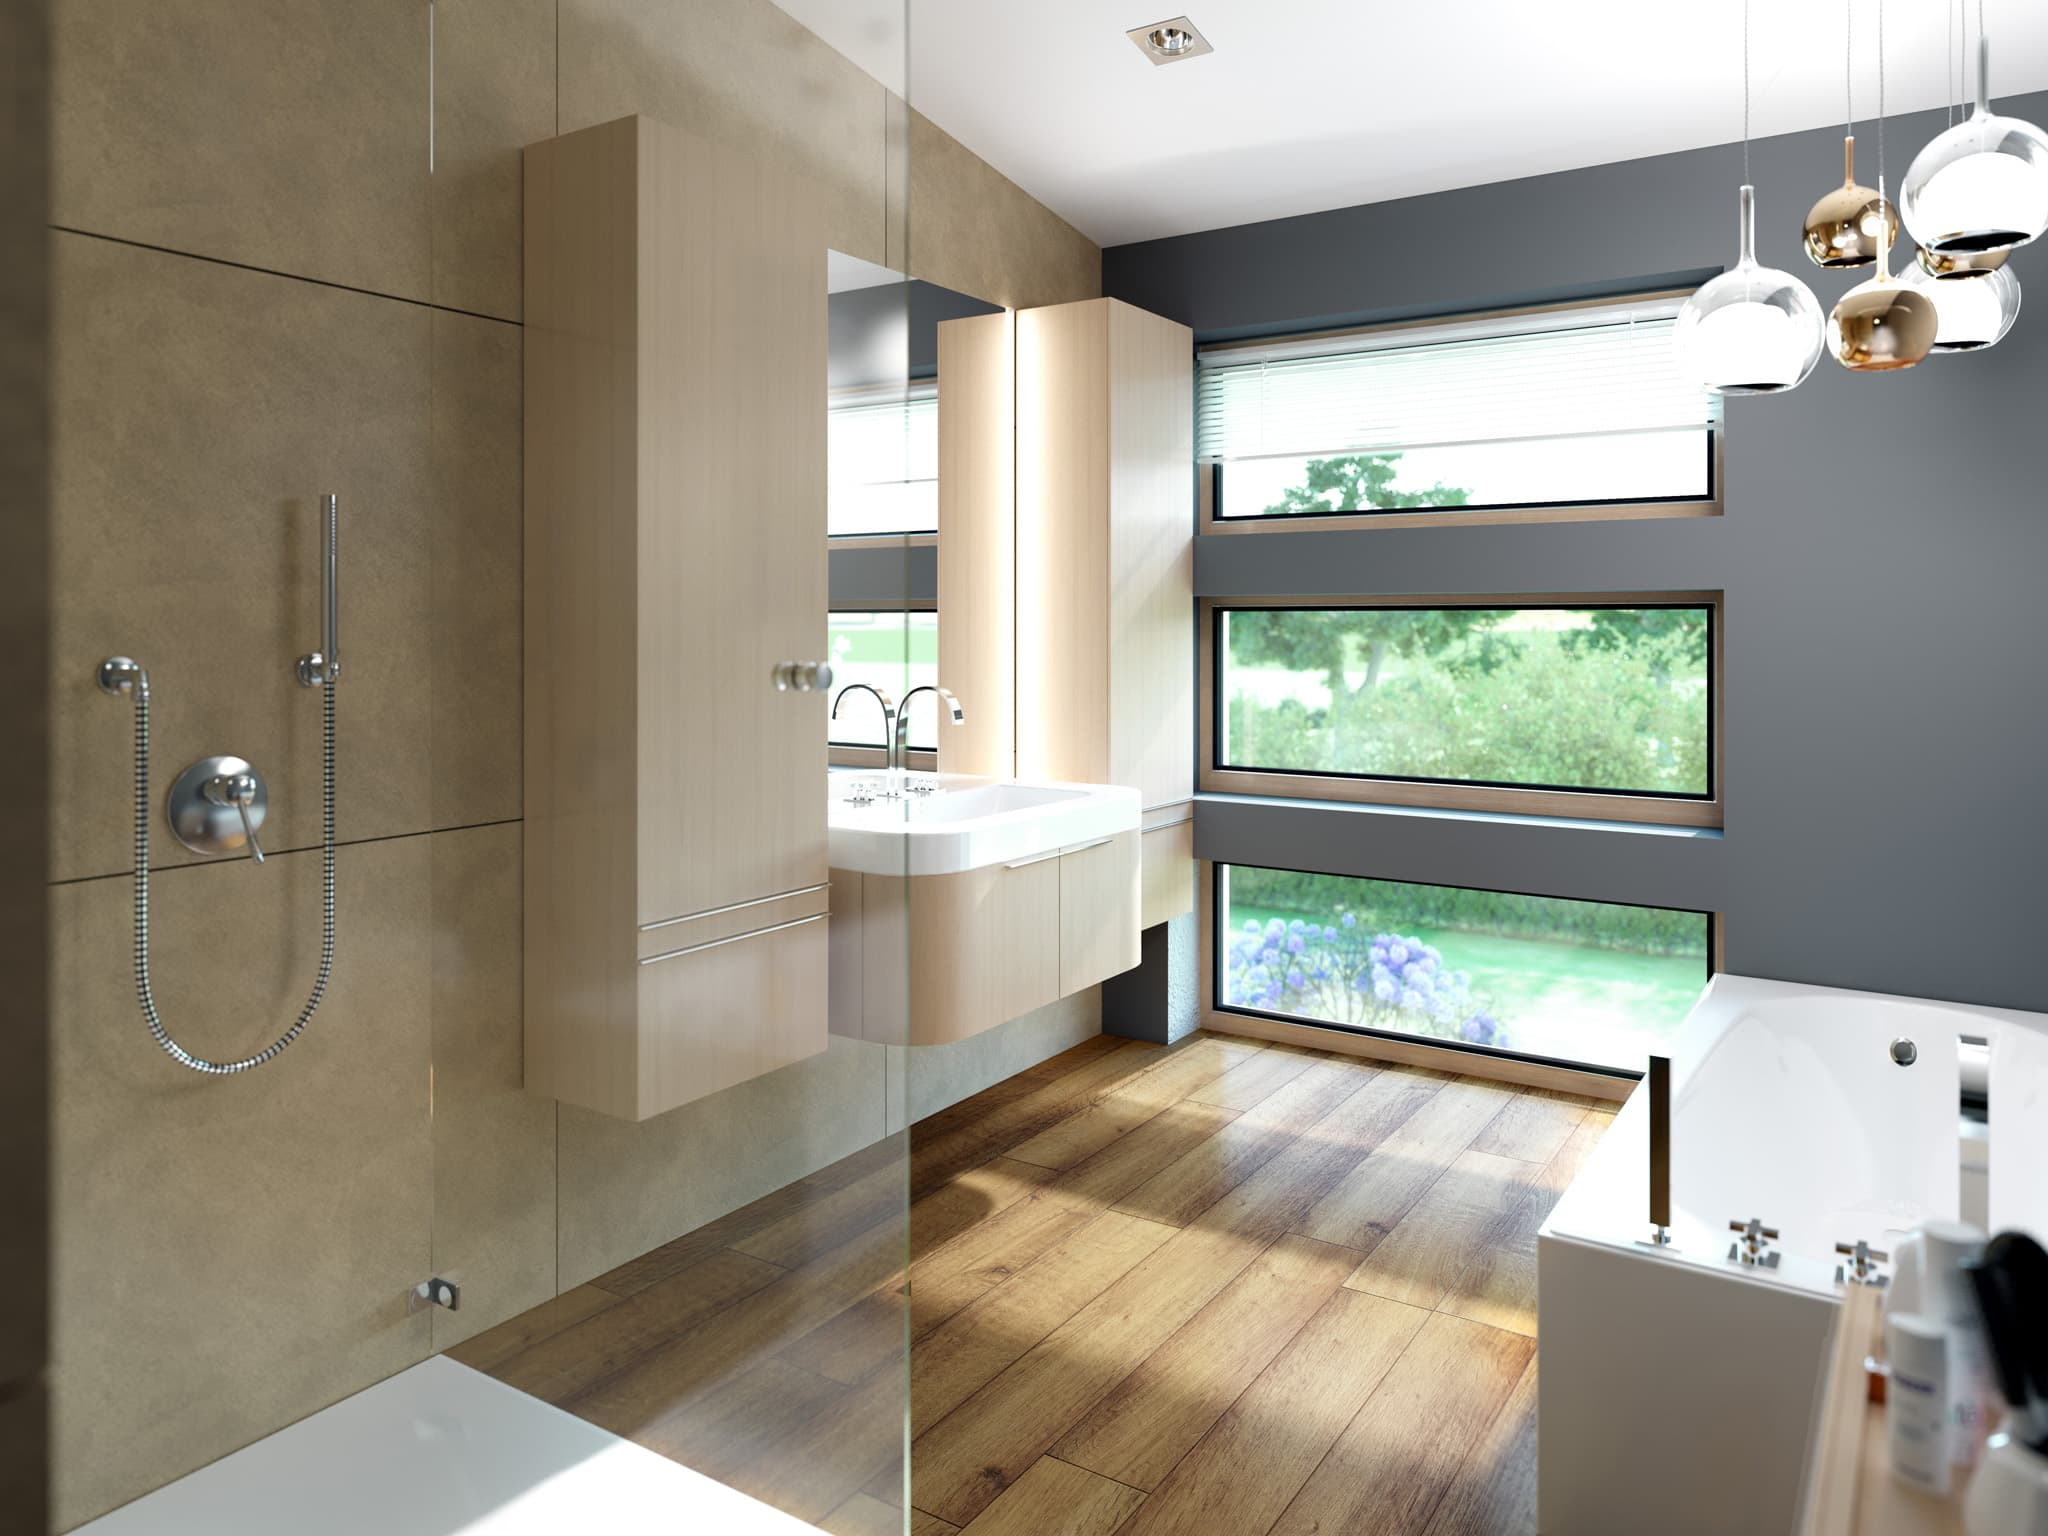 Bad Ideen - Inneneinrichtung Fertighaus SOLUTION 204 V6 von Living Haus - HausbauDirekt.de